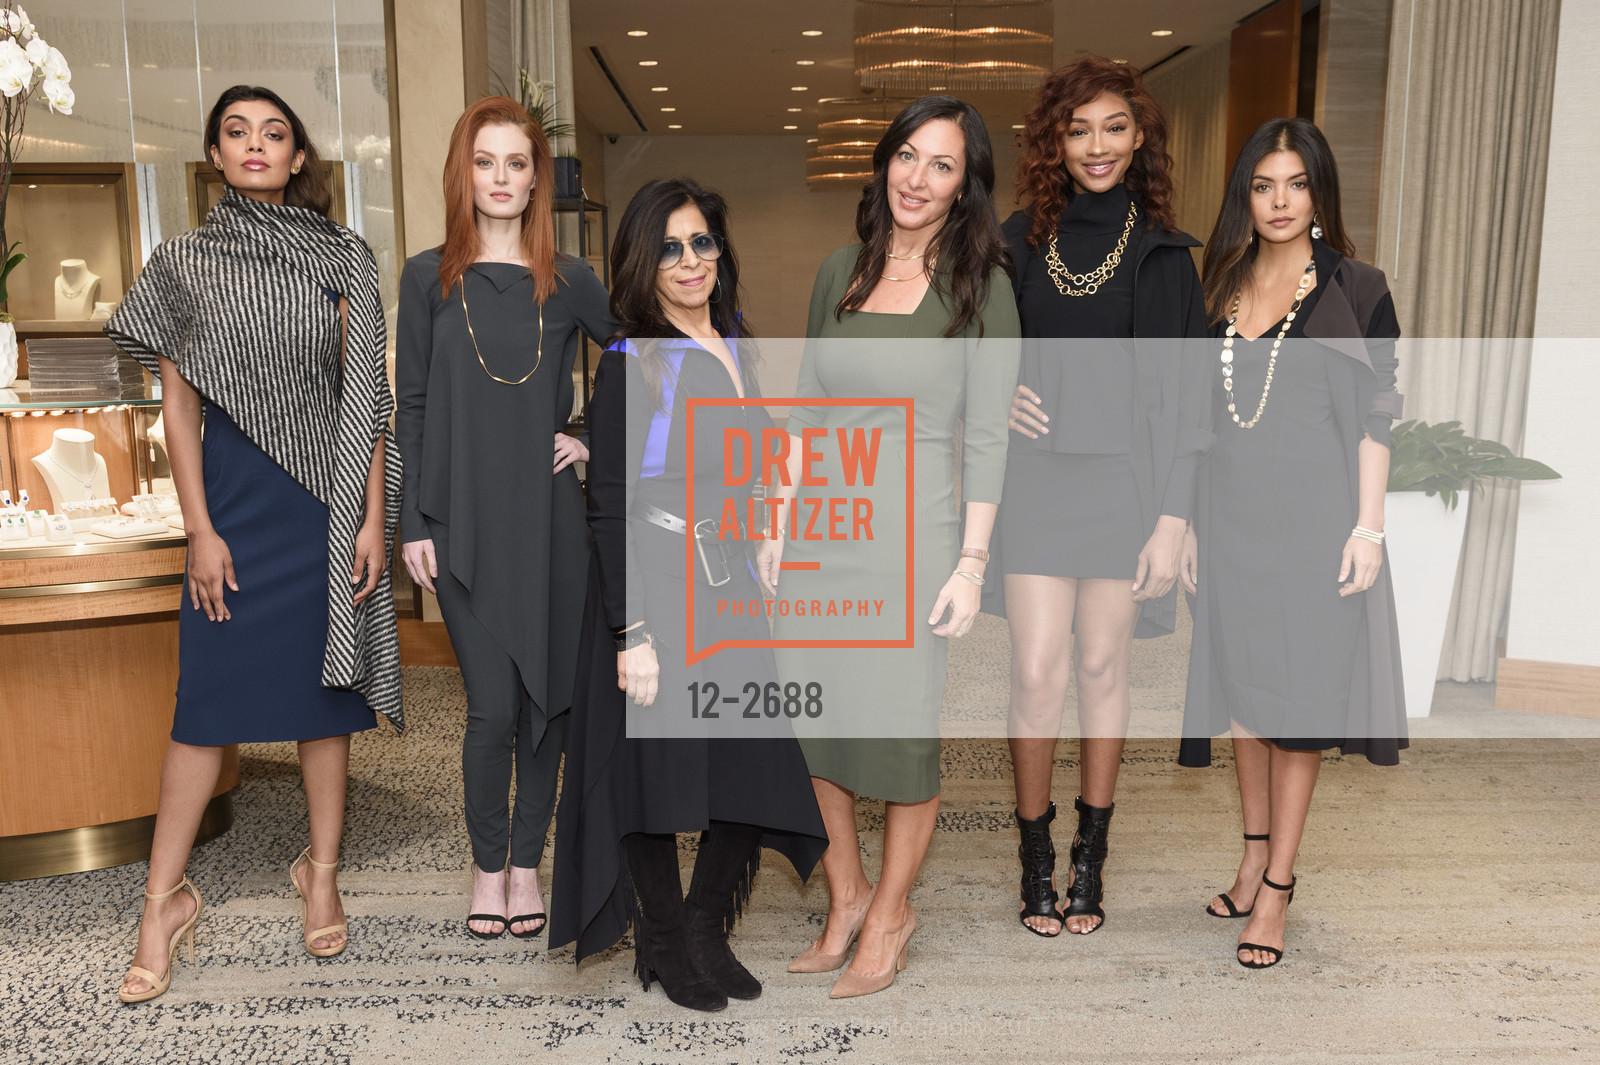 Ghazal Gill, Moana Holden, Maria Pinto, Deborah Cohen, Imani Walton, Leah Morris, Photo #12-2688